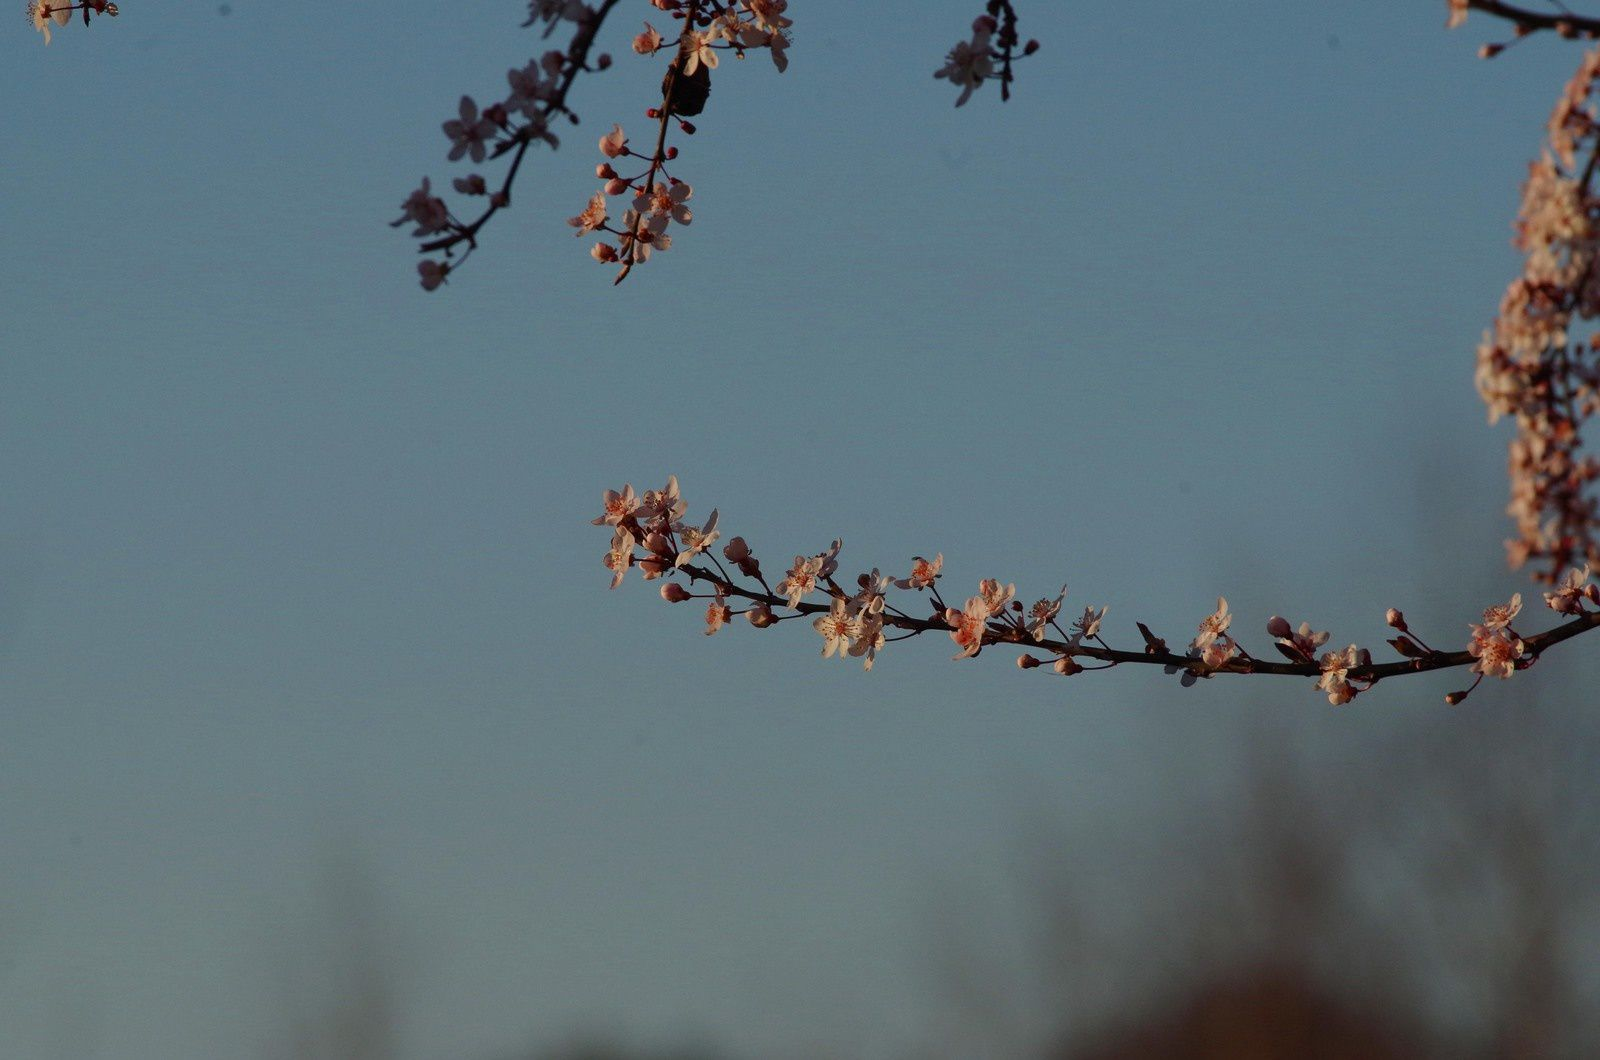 Arbres en fleurs.Prunus pissardi.Photos de JP.